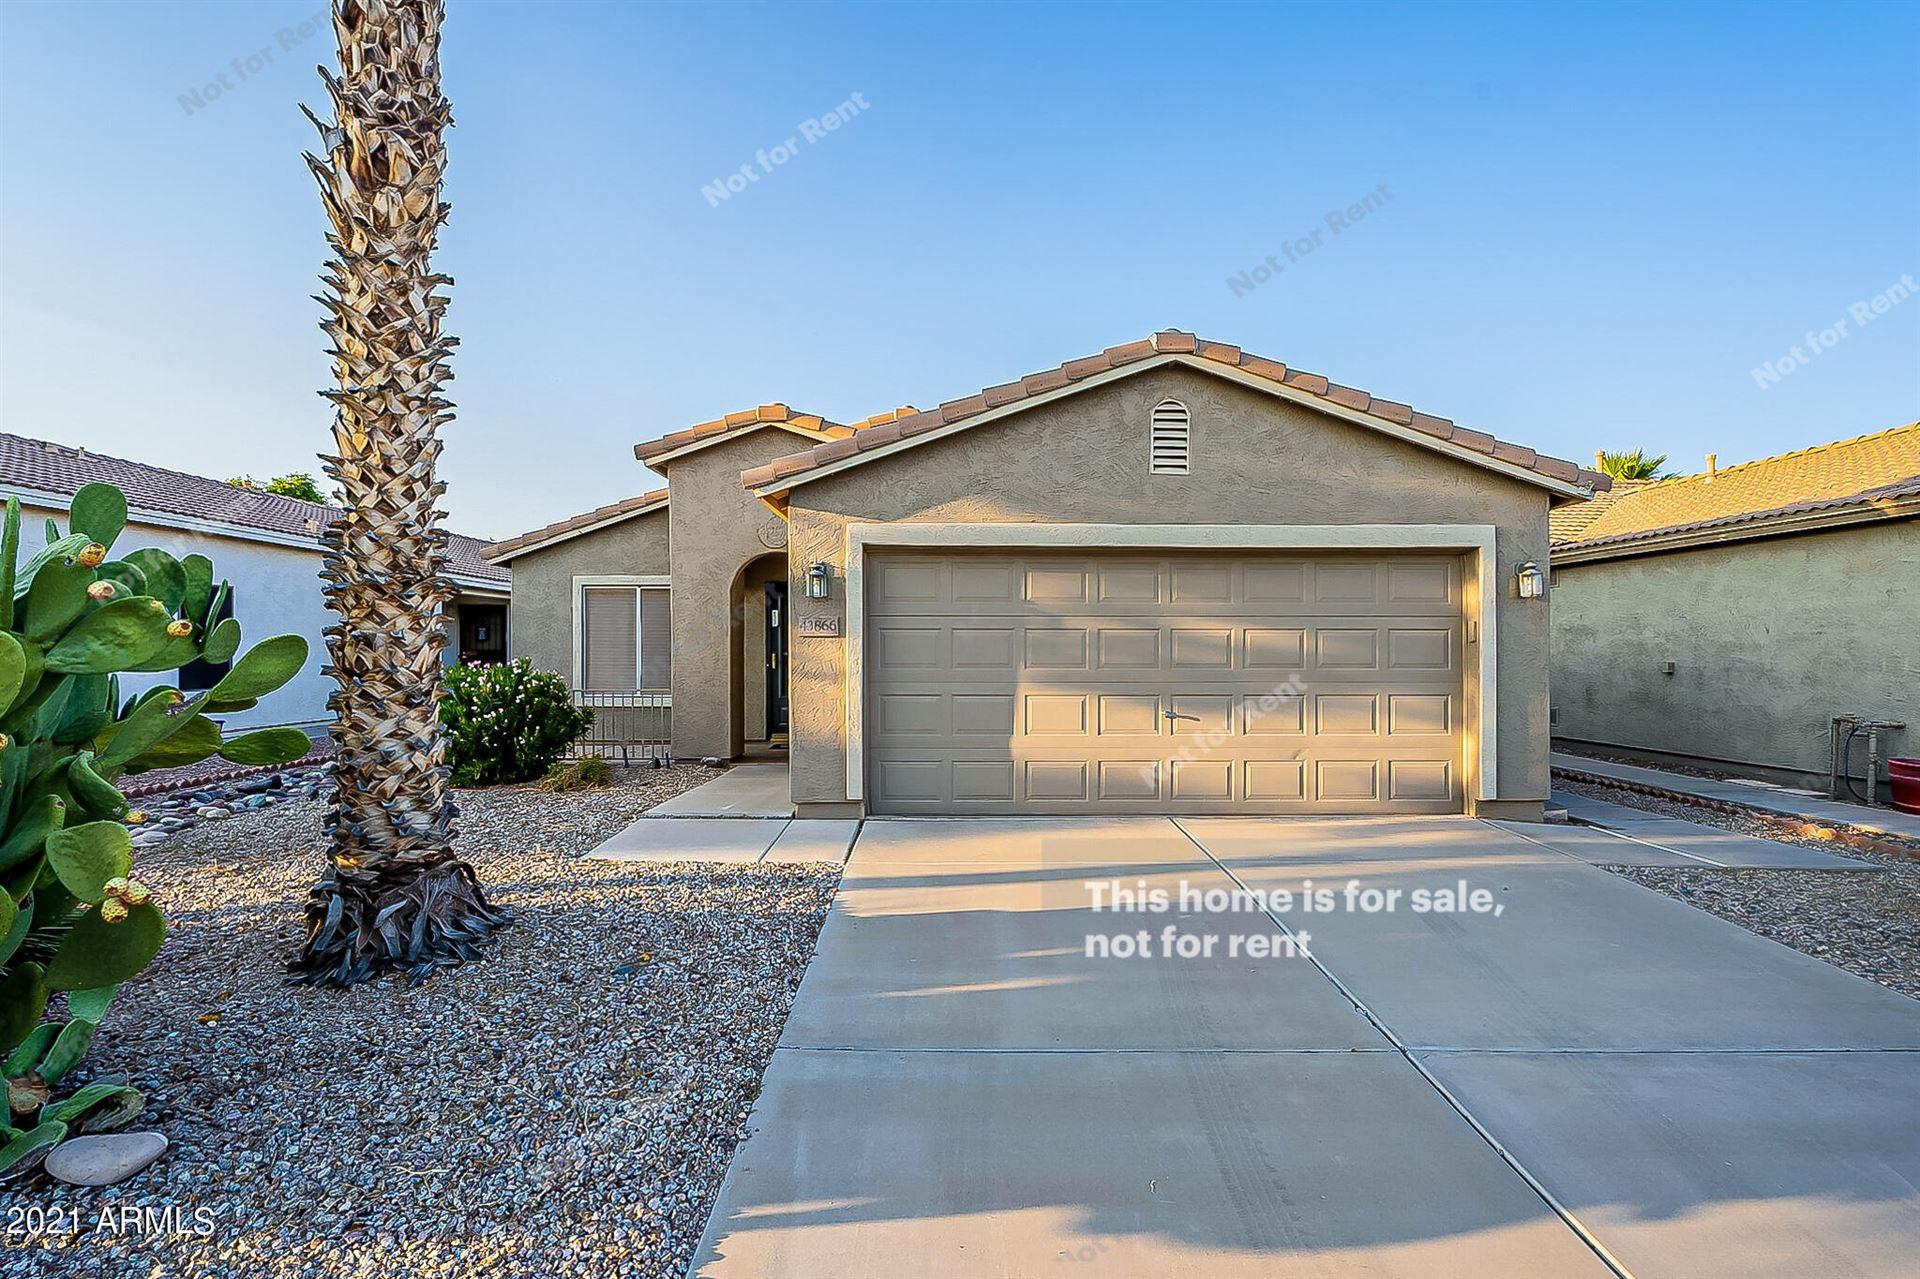 Photo of 43866 W SAGEBRUSH Trail, Maricopa, AZ 85138 (MLS # 6295093)